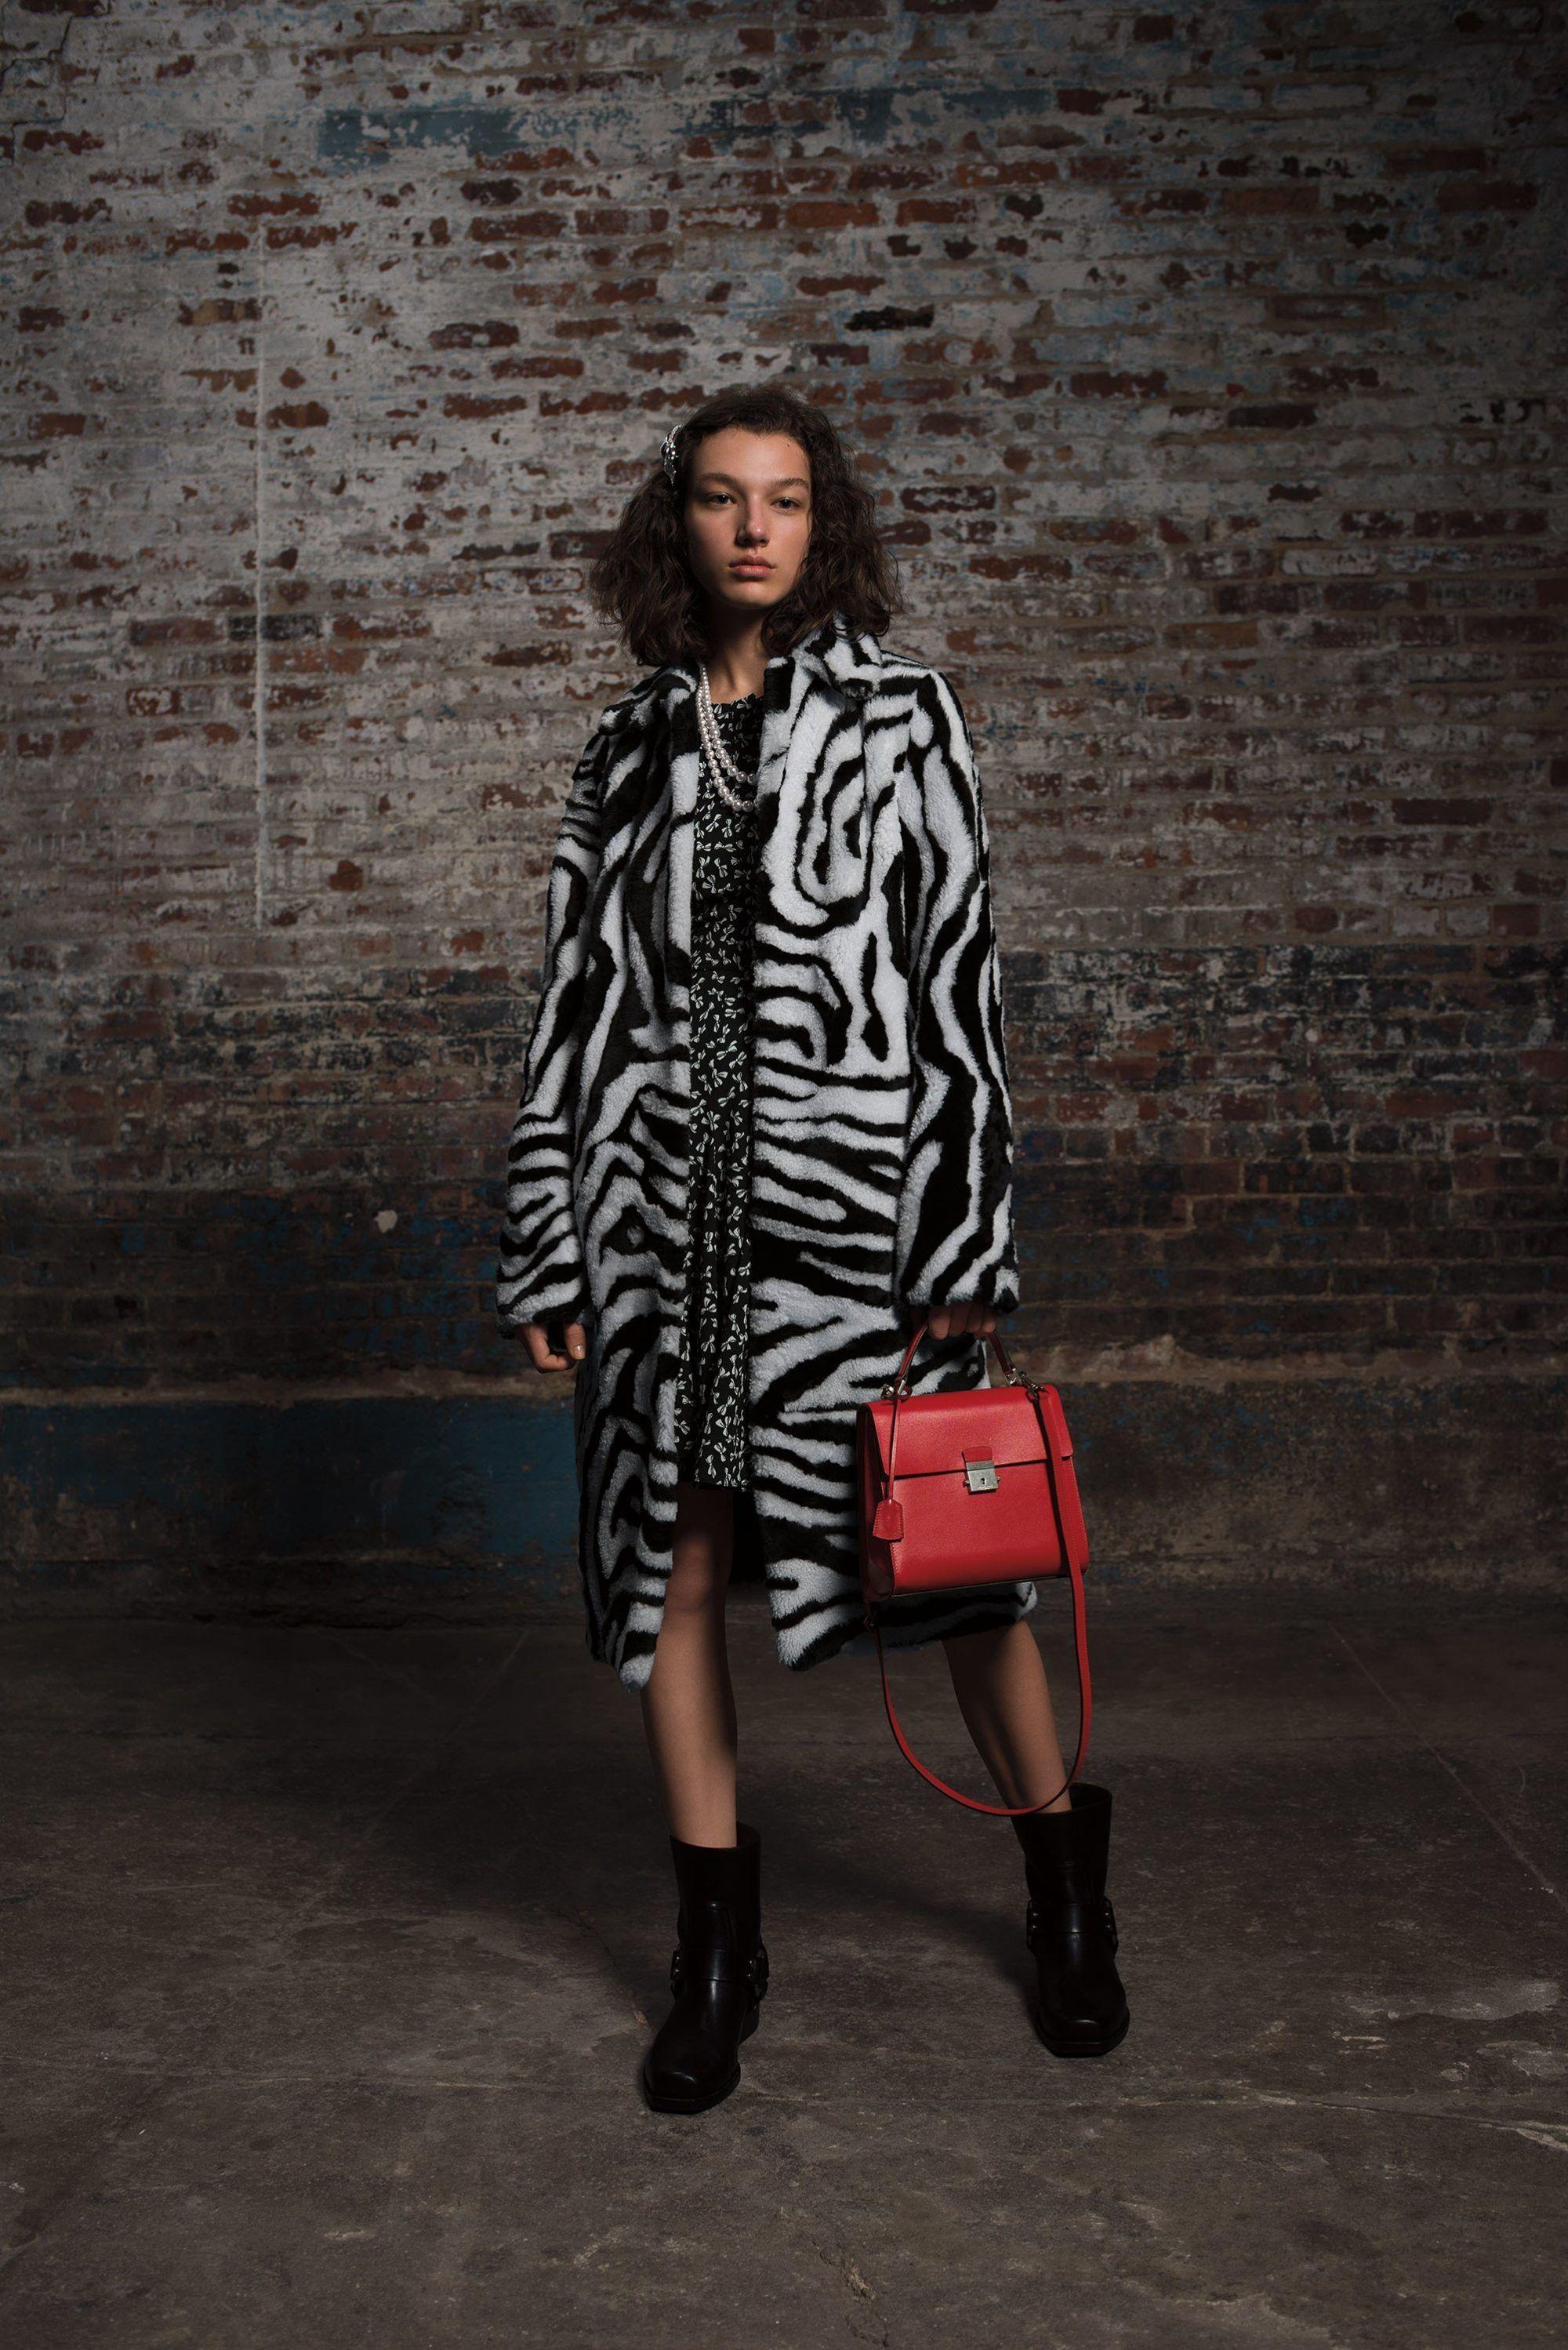 90ecfb21458a Michael Kors Collection | fall-winter 2018/2019 vogue | Fashion ...